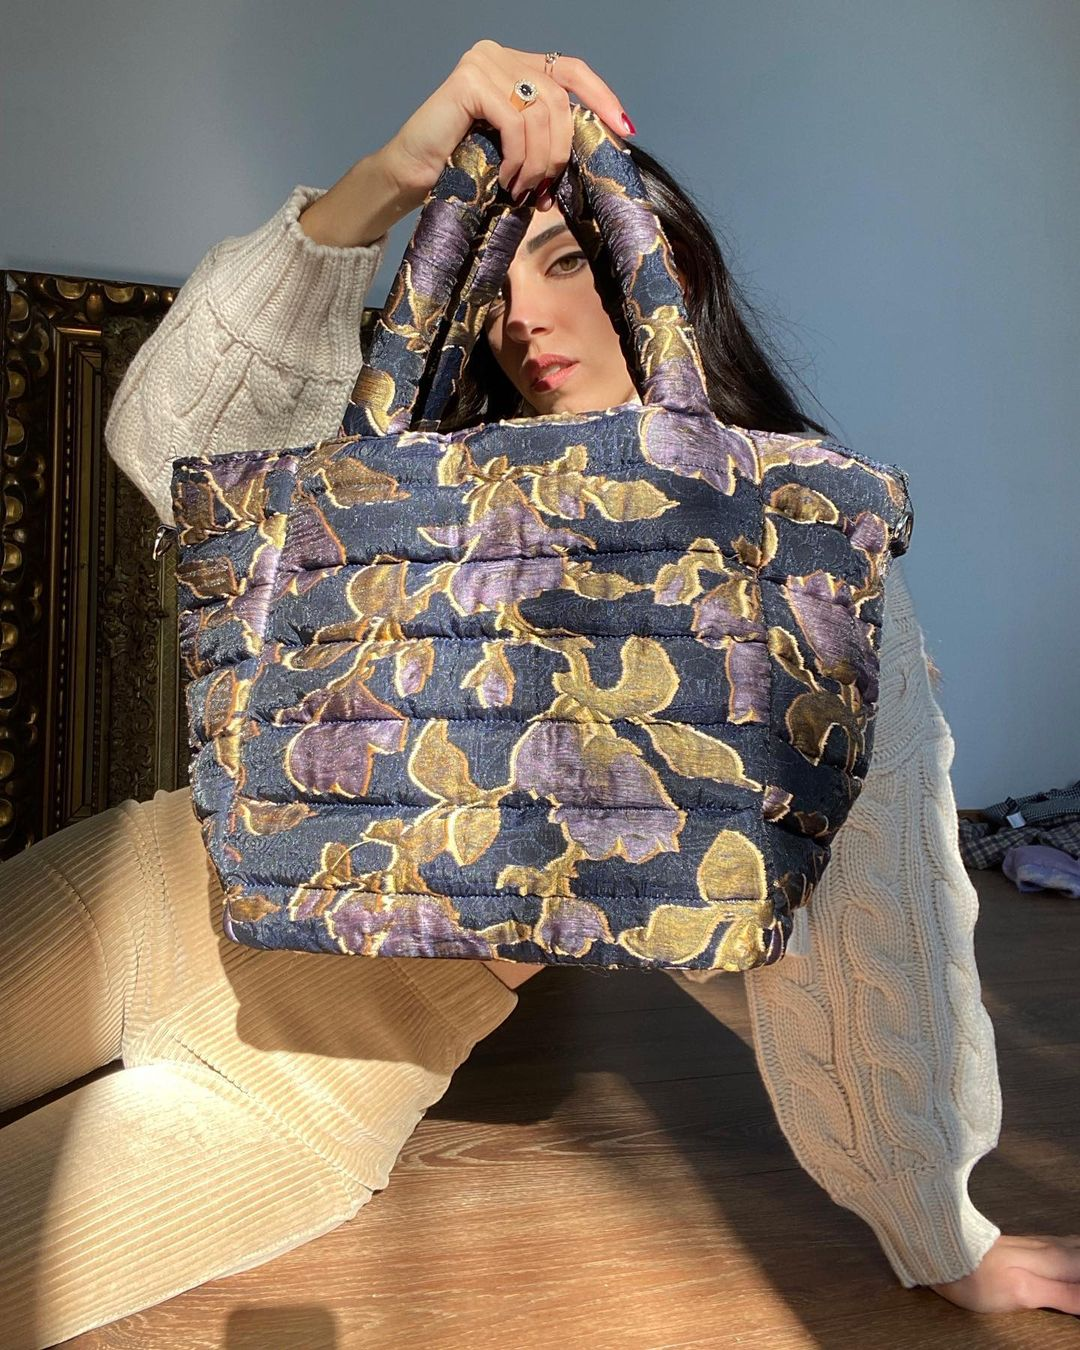 girl holding handbag